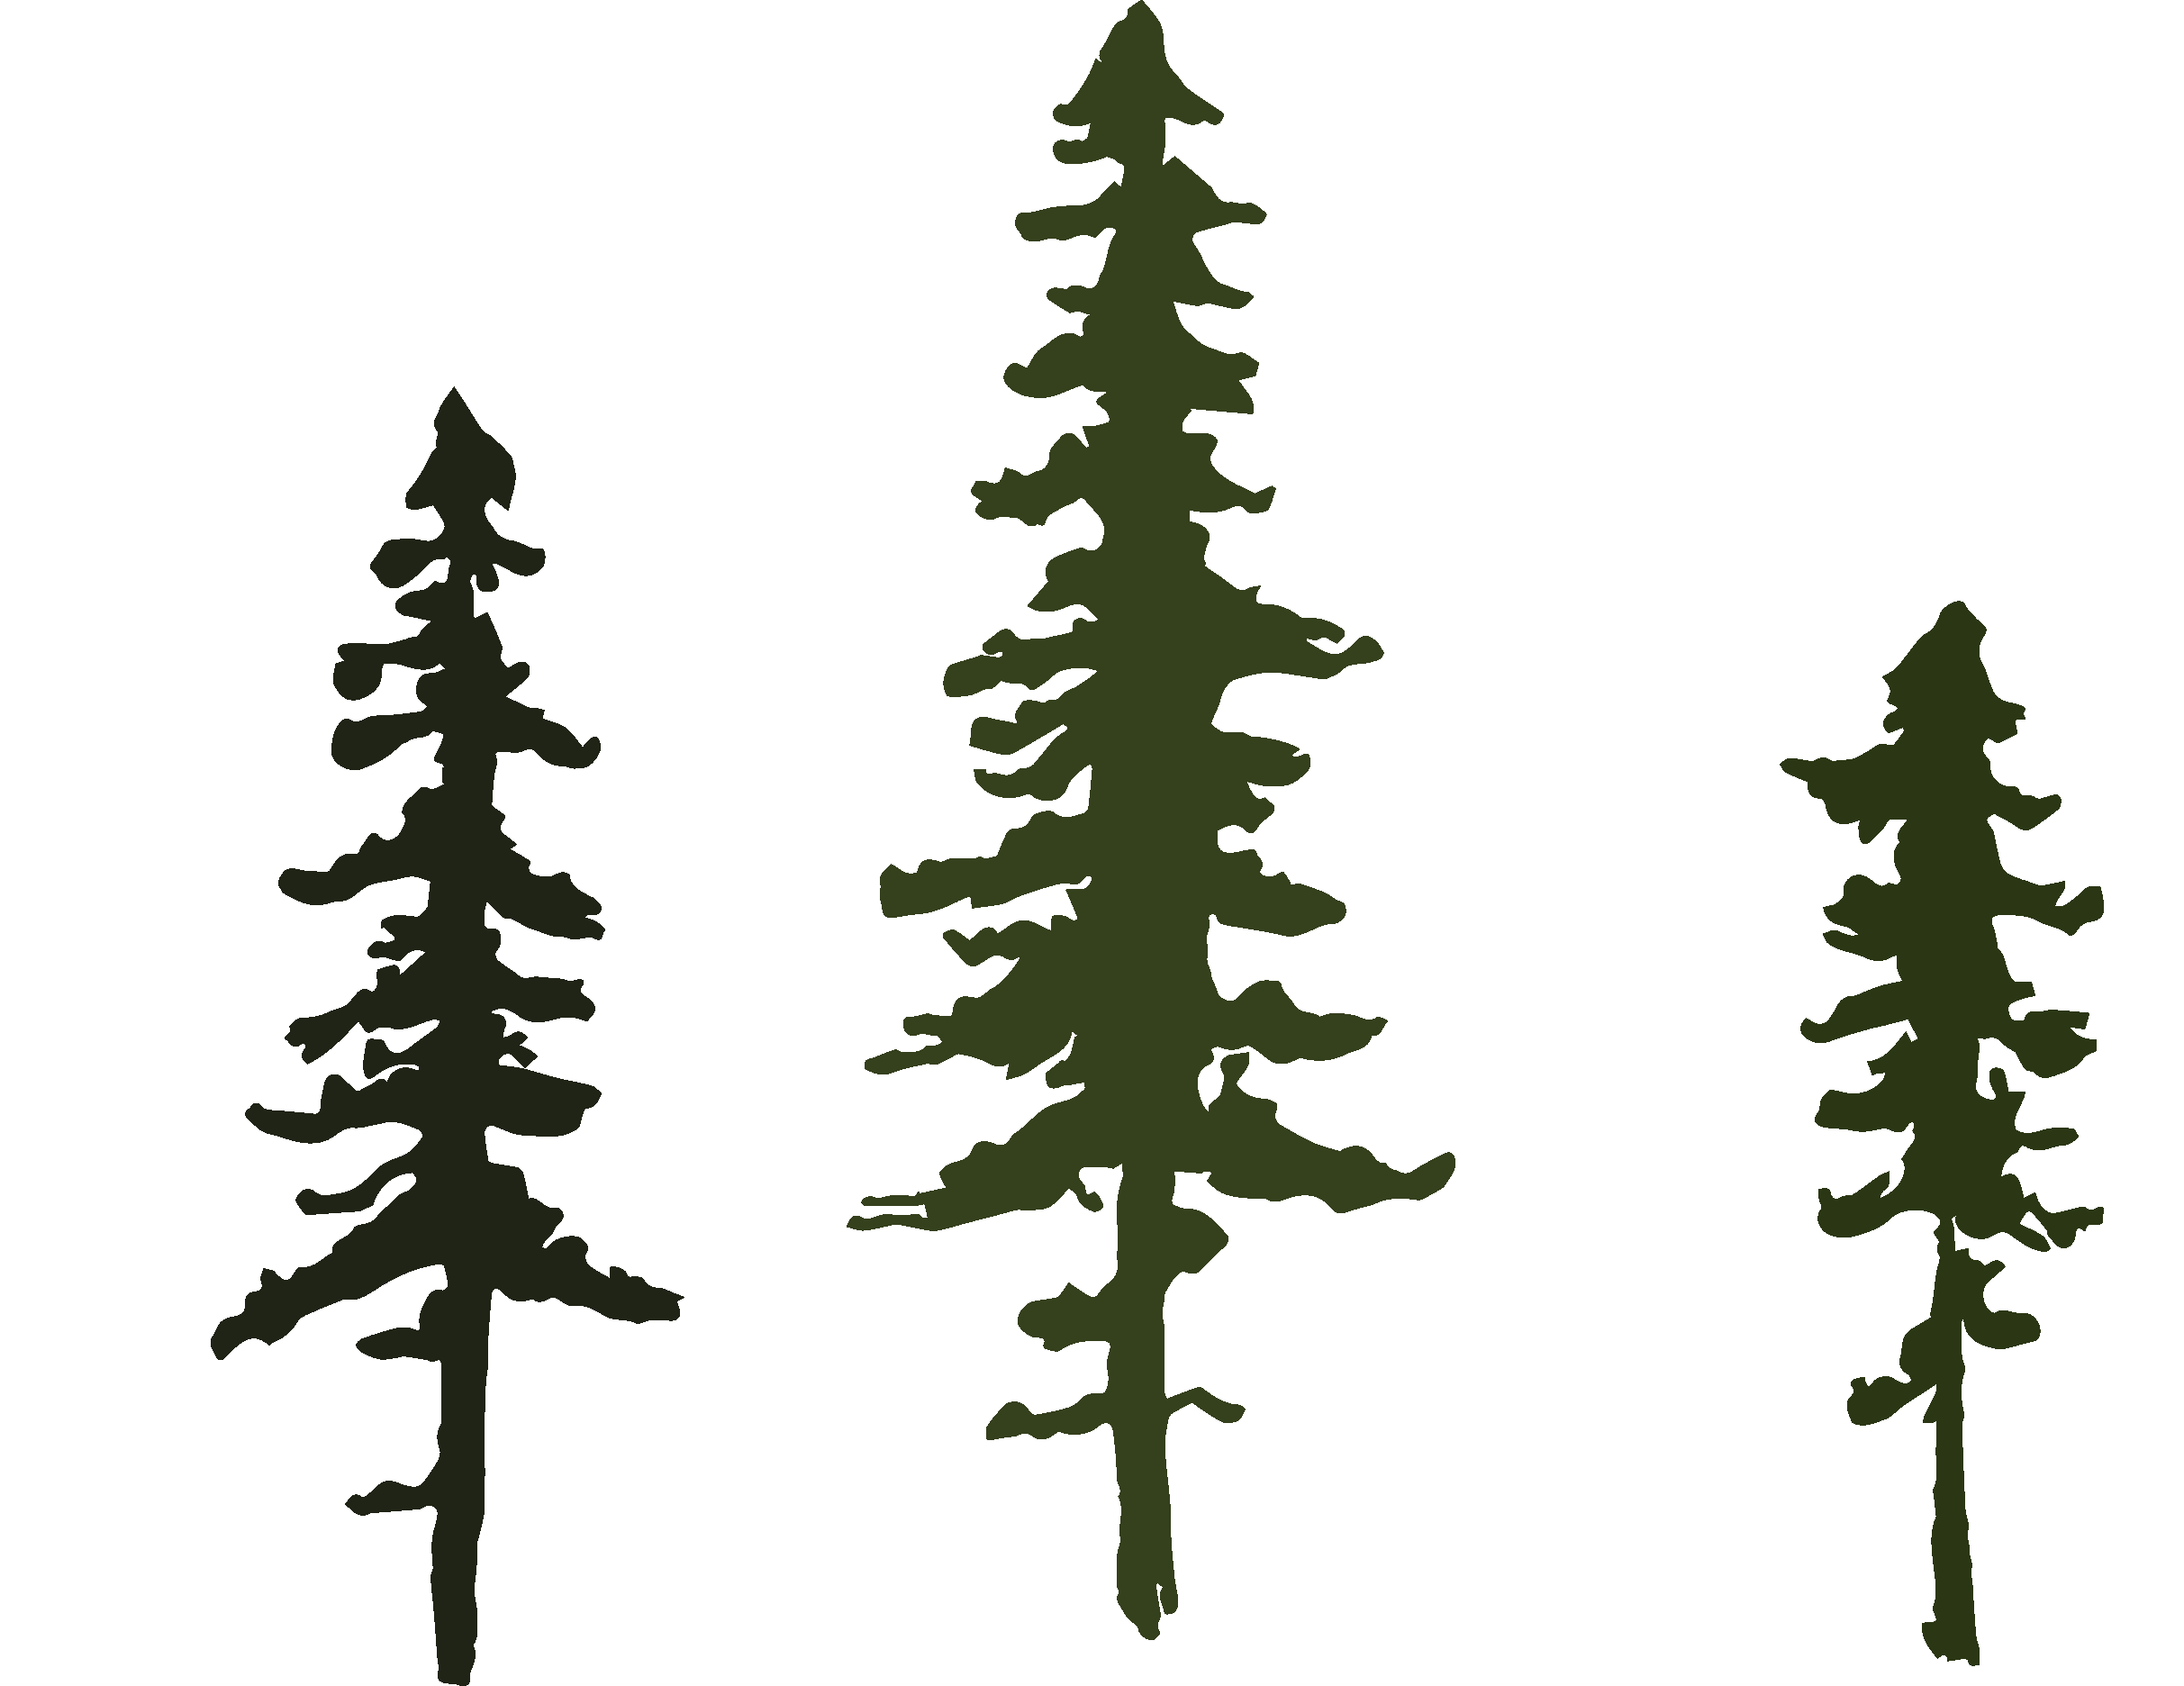 logo_eli_stromy copy.png